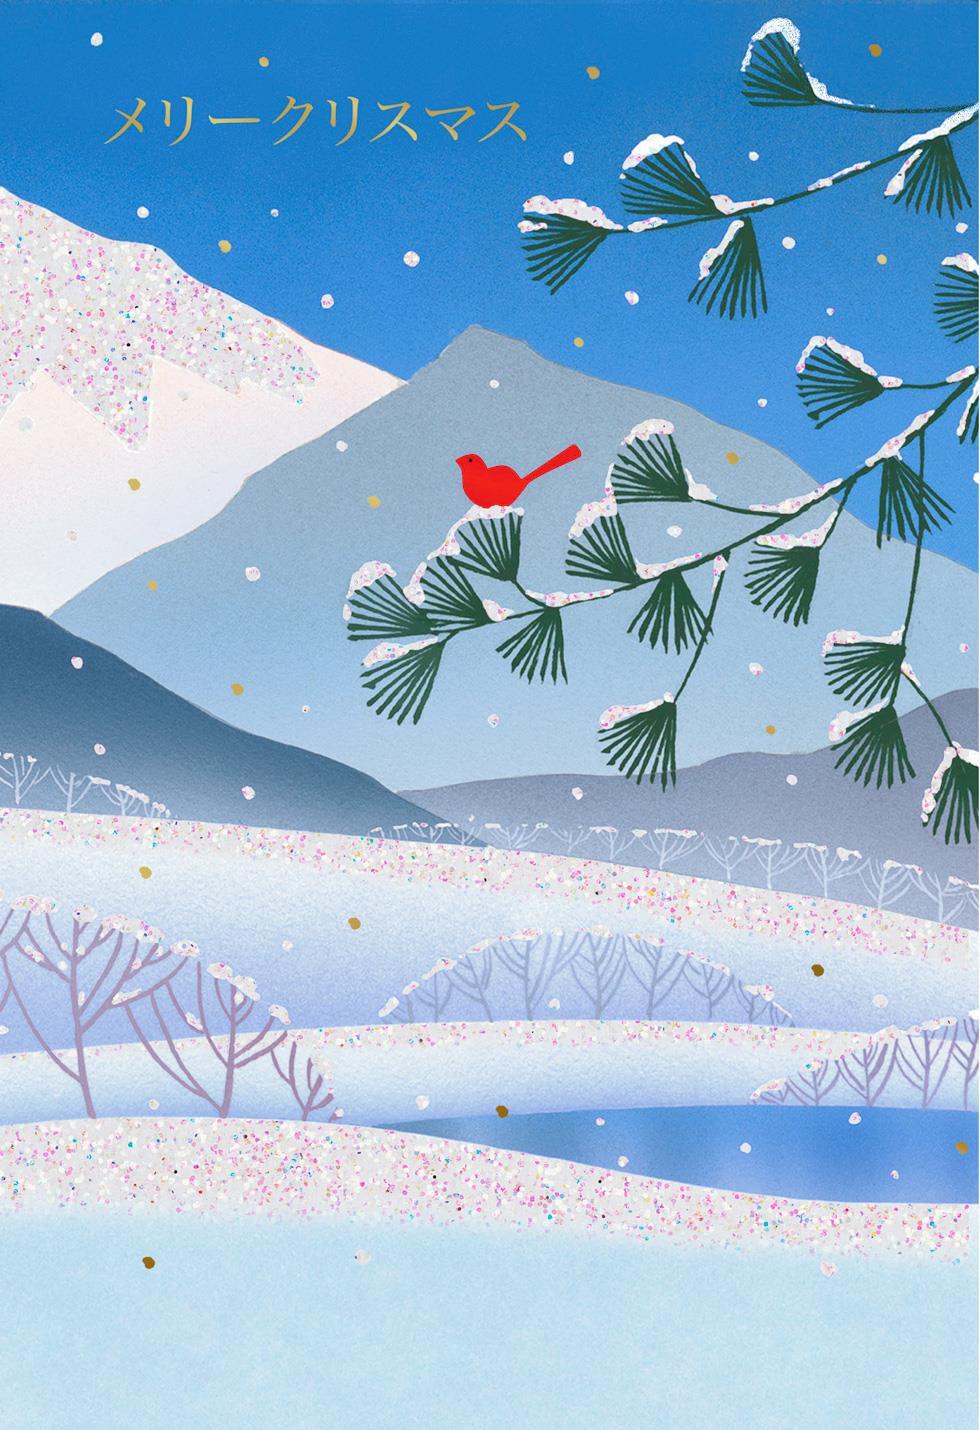 Snowy mountains japanese language christmas card greeting cards snowy mountains japanese language christmas card greeting cards hallmark m4hsunfo